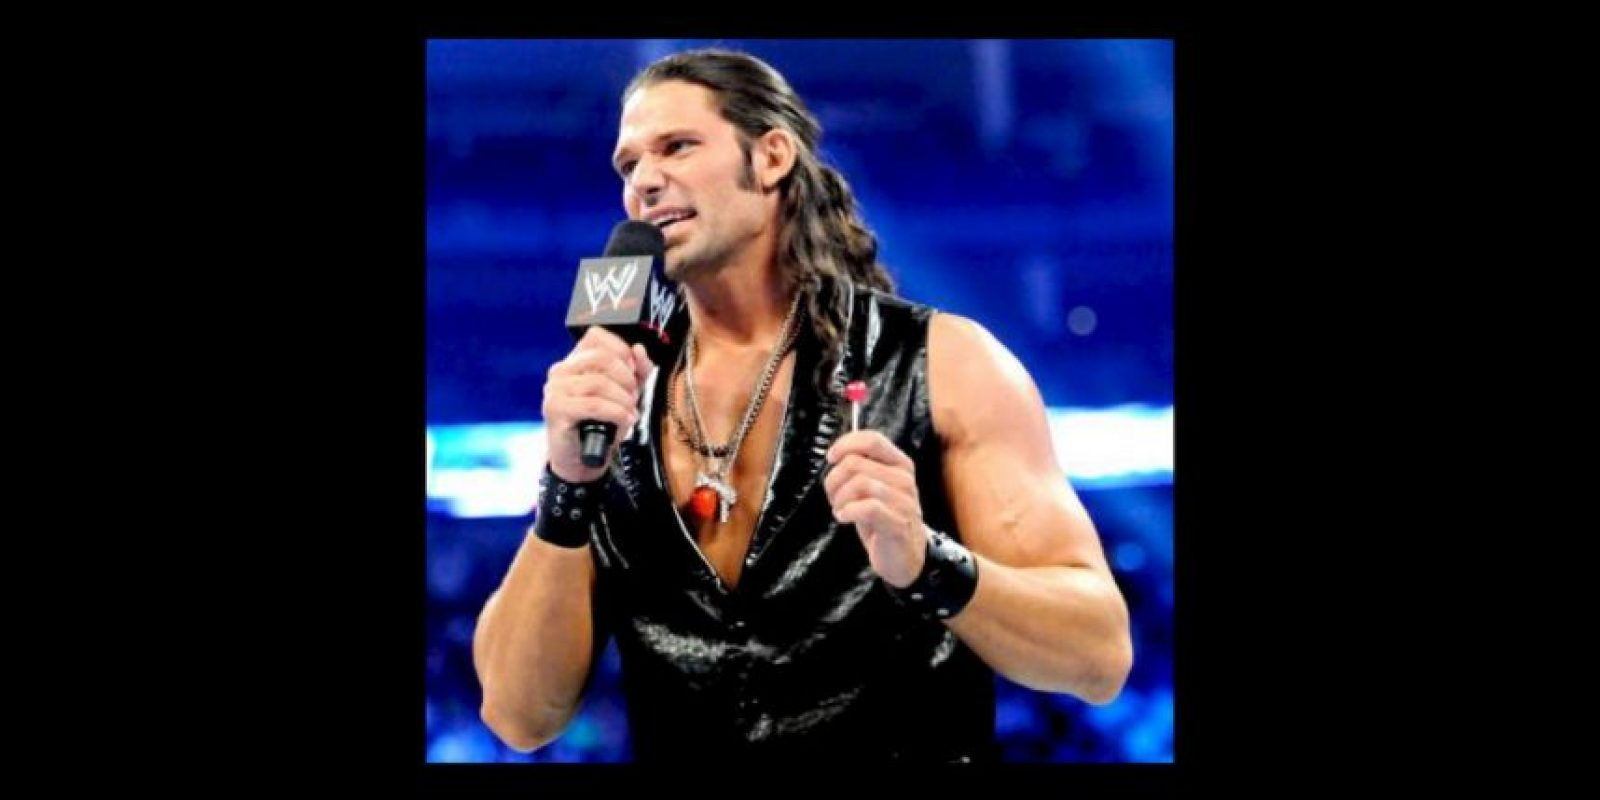 "Ahora era miembro del grupo ""The Social Outcast"", junto a Bo Dallas, Curtis Axel, Heath Slater y Viktor Foto:WWE"